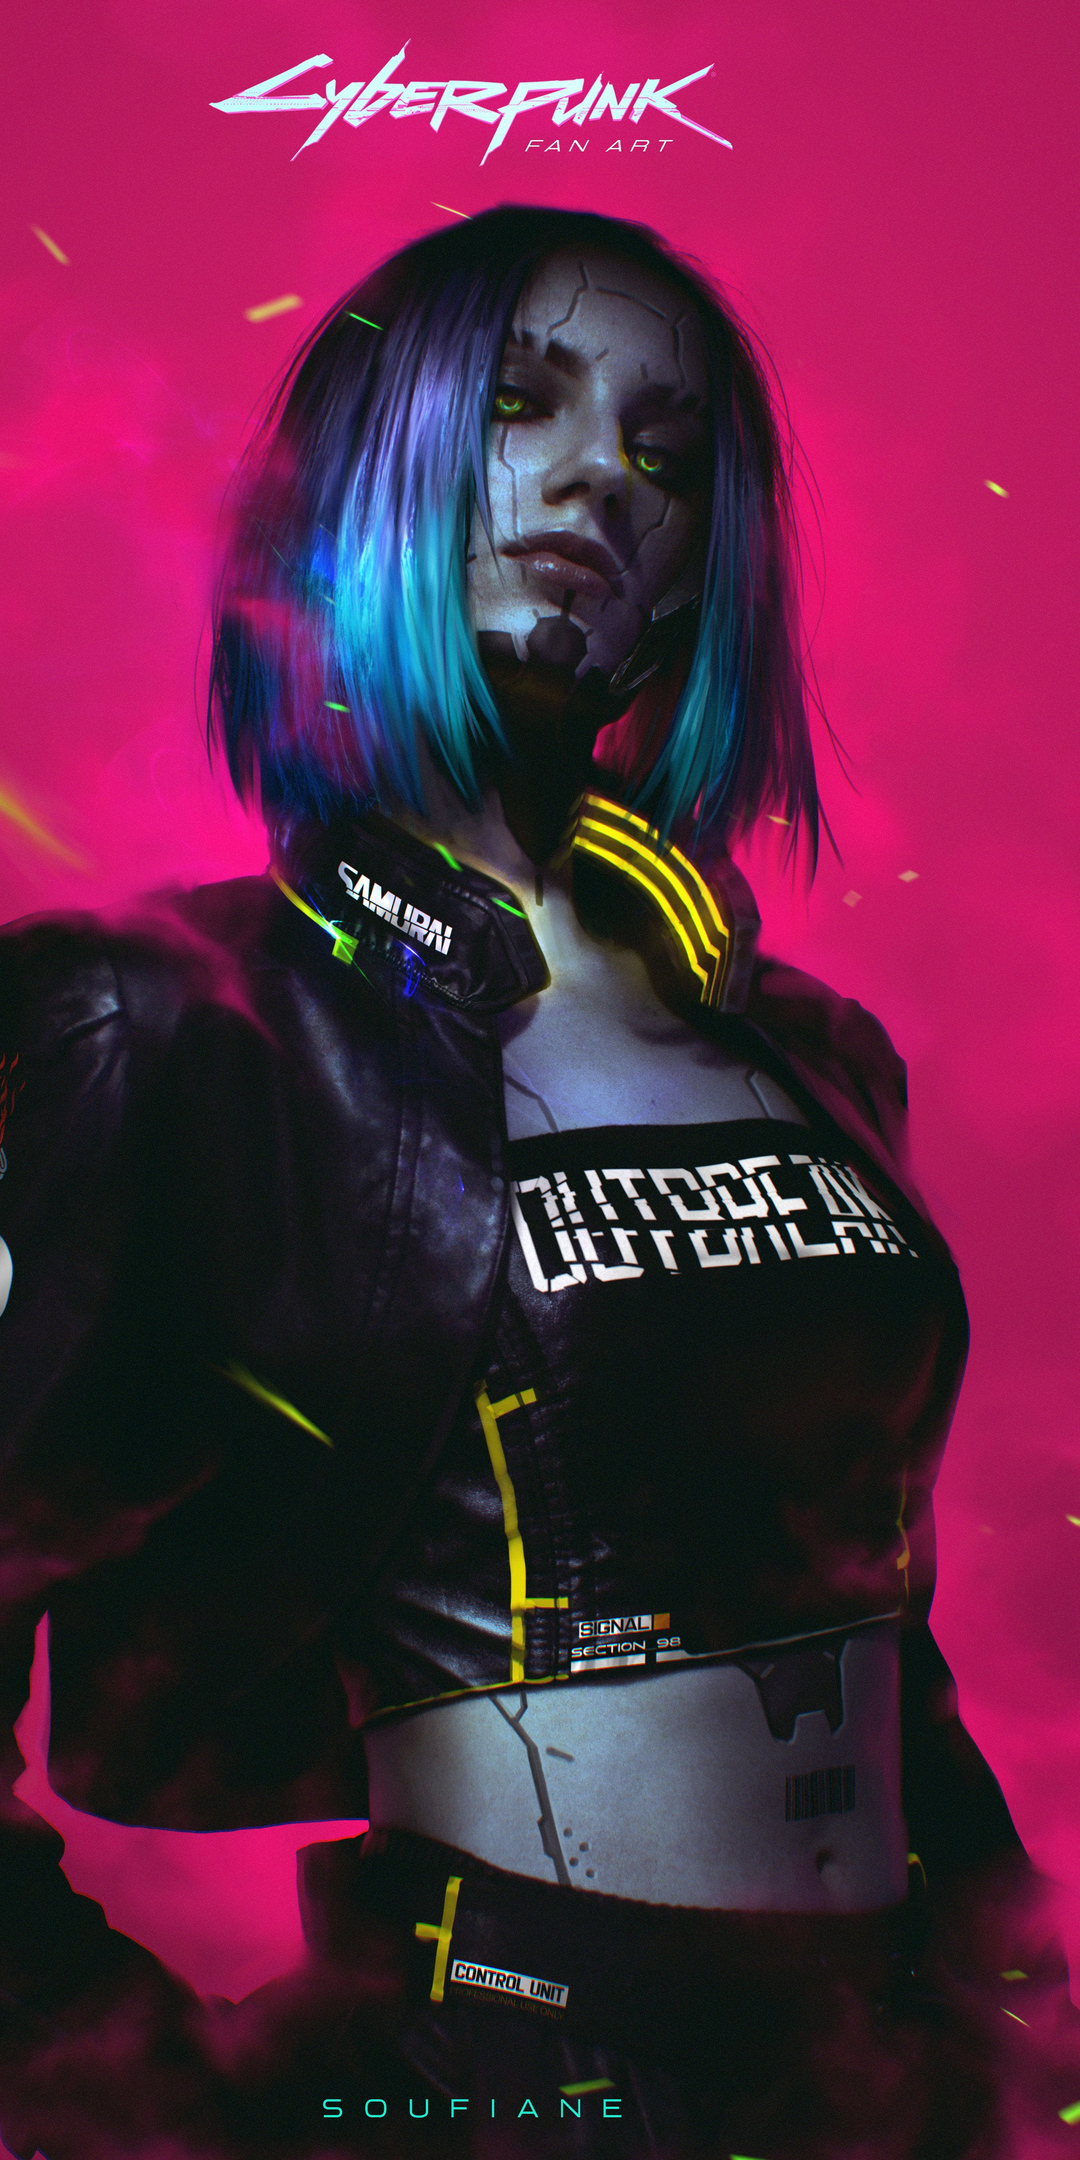 1080x2160 Cyberpunk 2077 4k Artwork One Plus 5T,Honor 7x ...